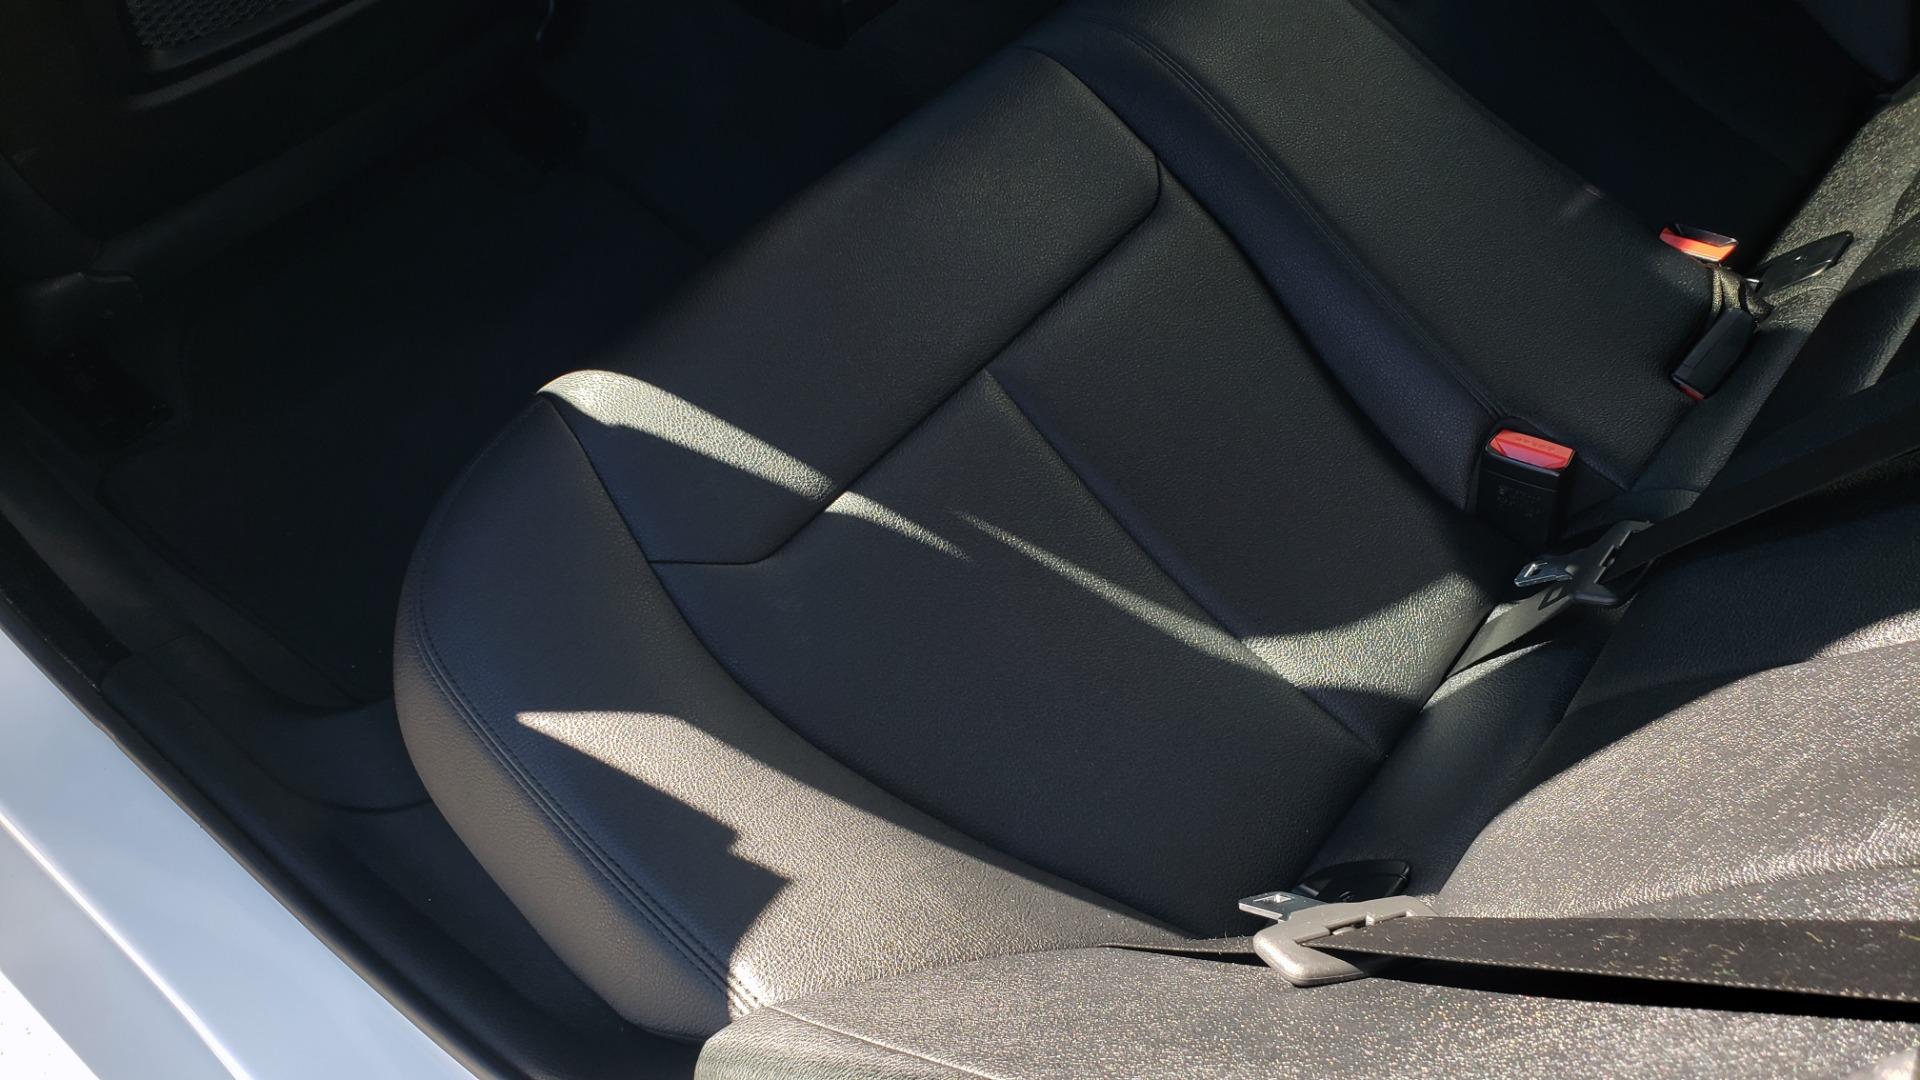 Used 2018 BMW 4 SERIES 430IXDRIVE / PREMIUM / NAV / SUNROOF / ESSENTIALS PKG for sale $27,795 at Formula Imports in Charlotte NC 28227 63